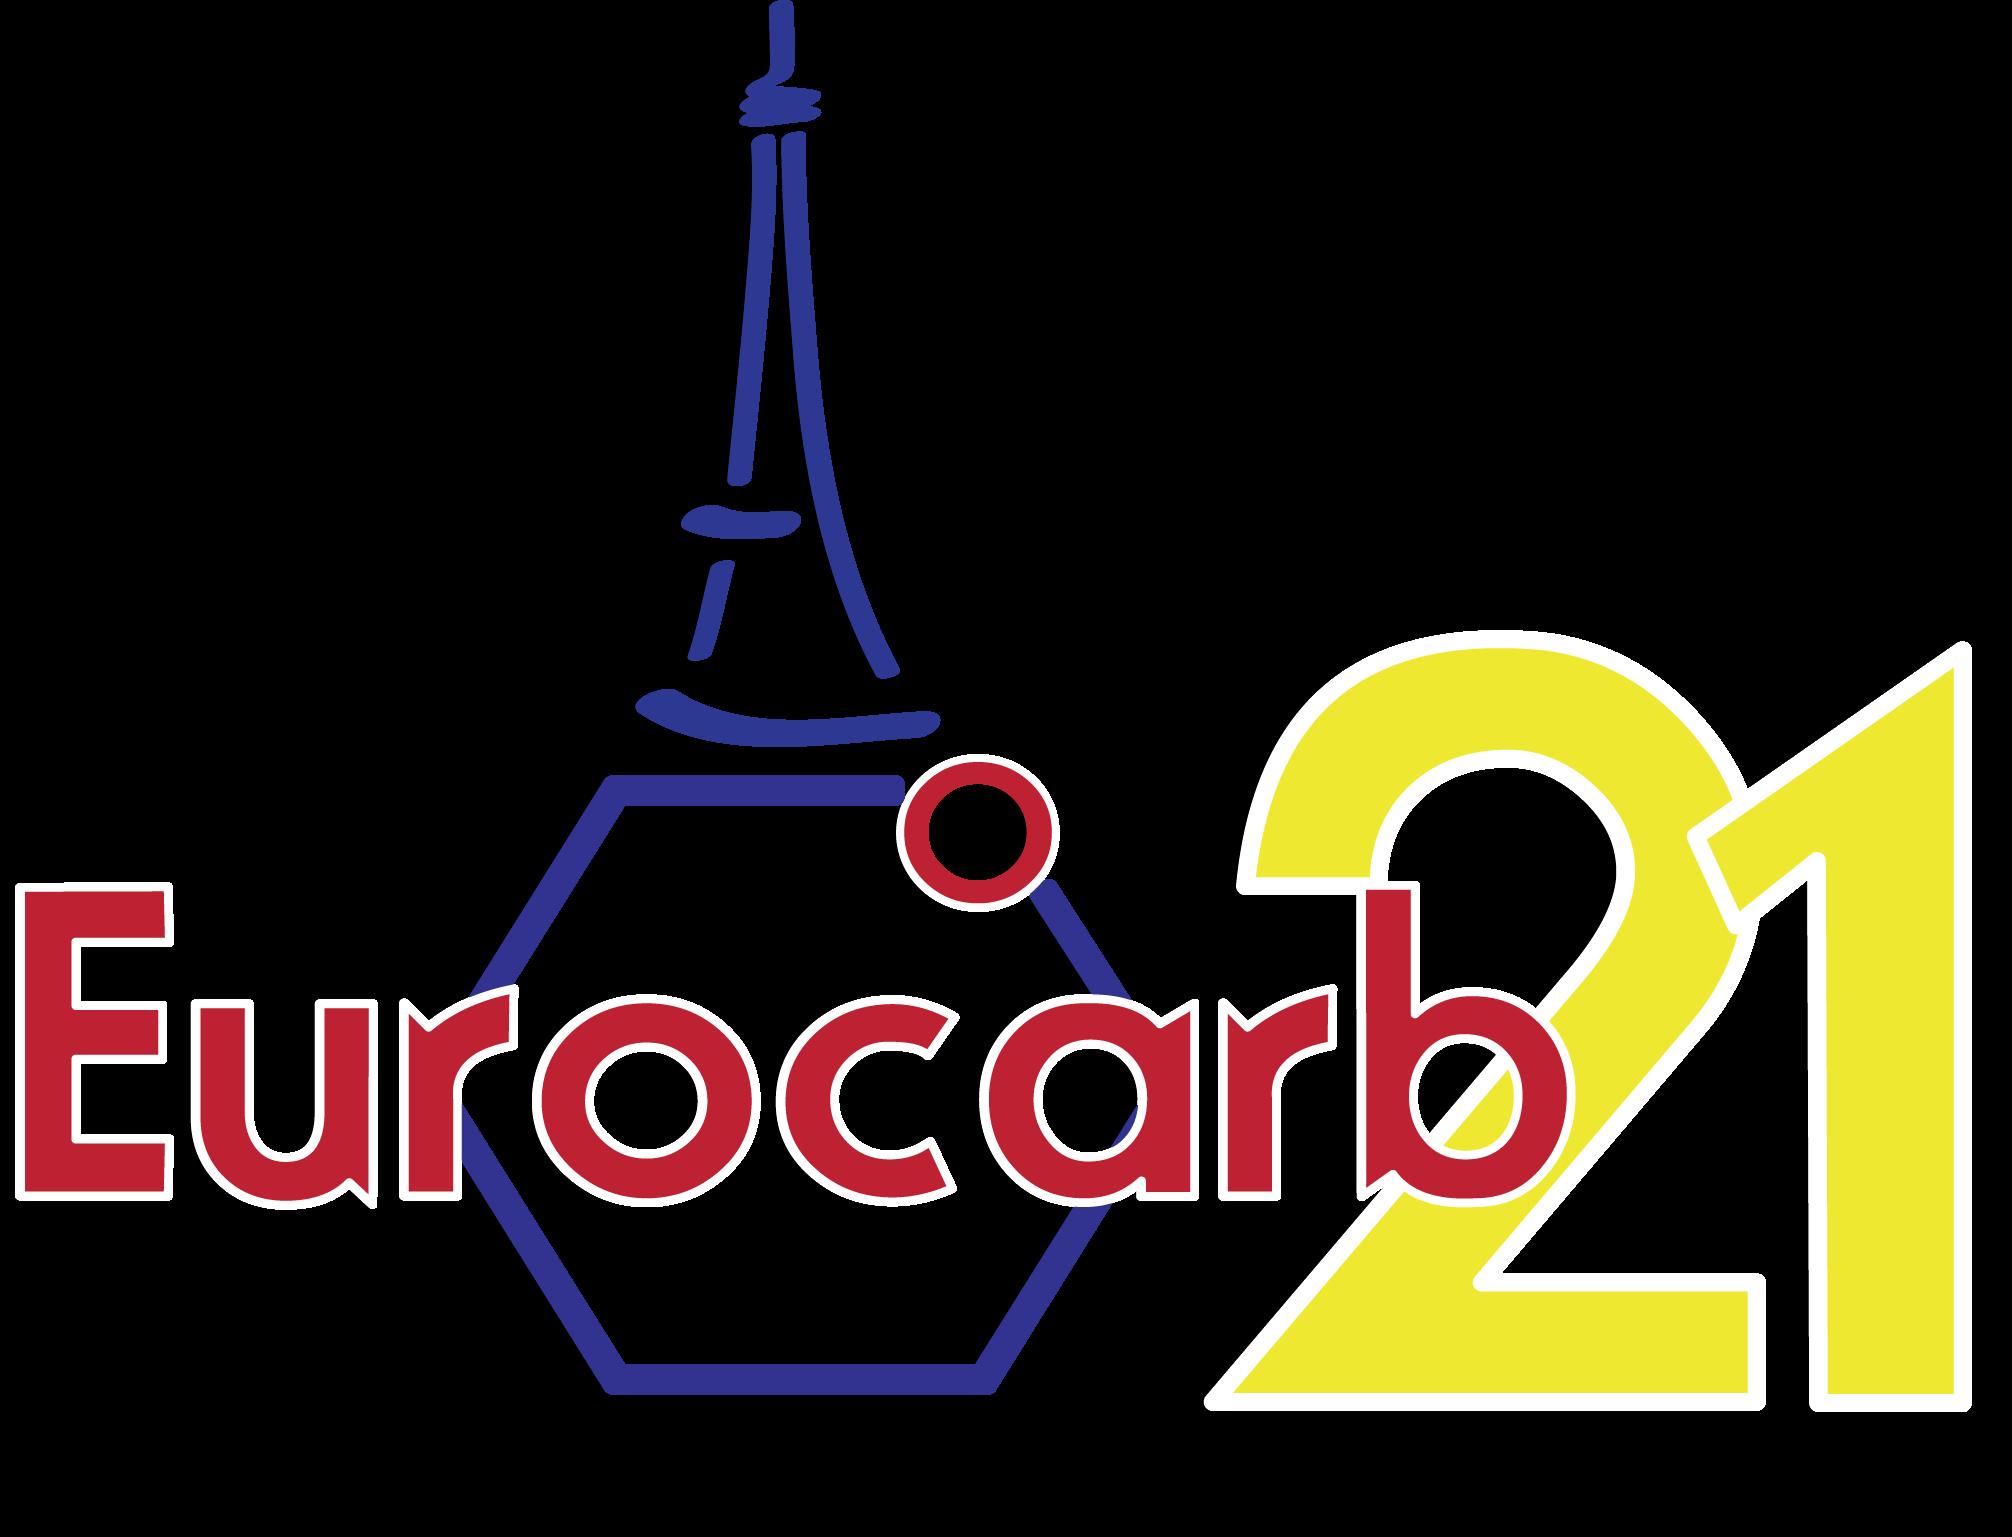 LOGO EUROCAB21